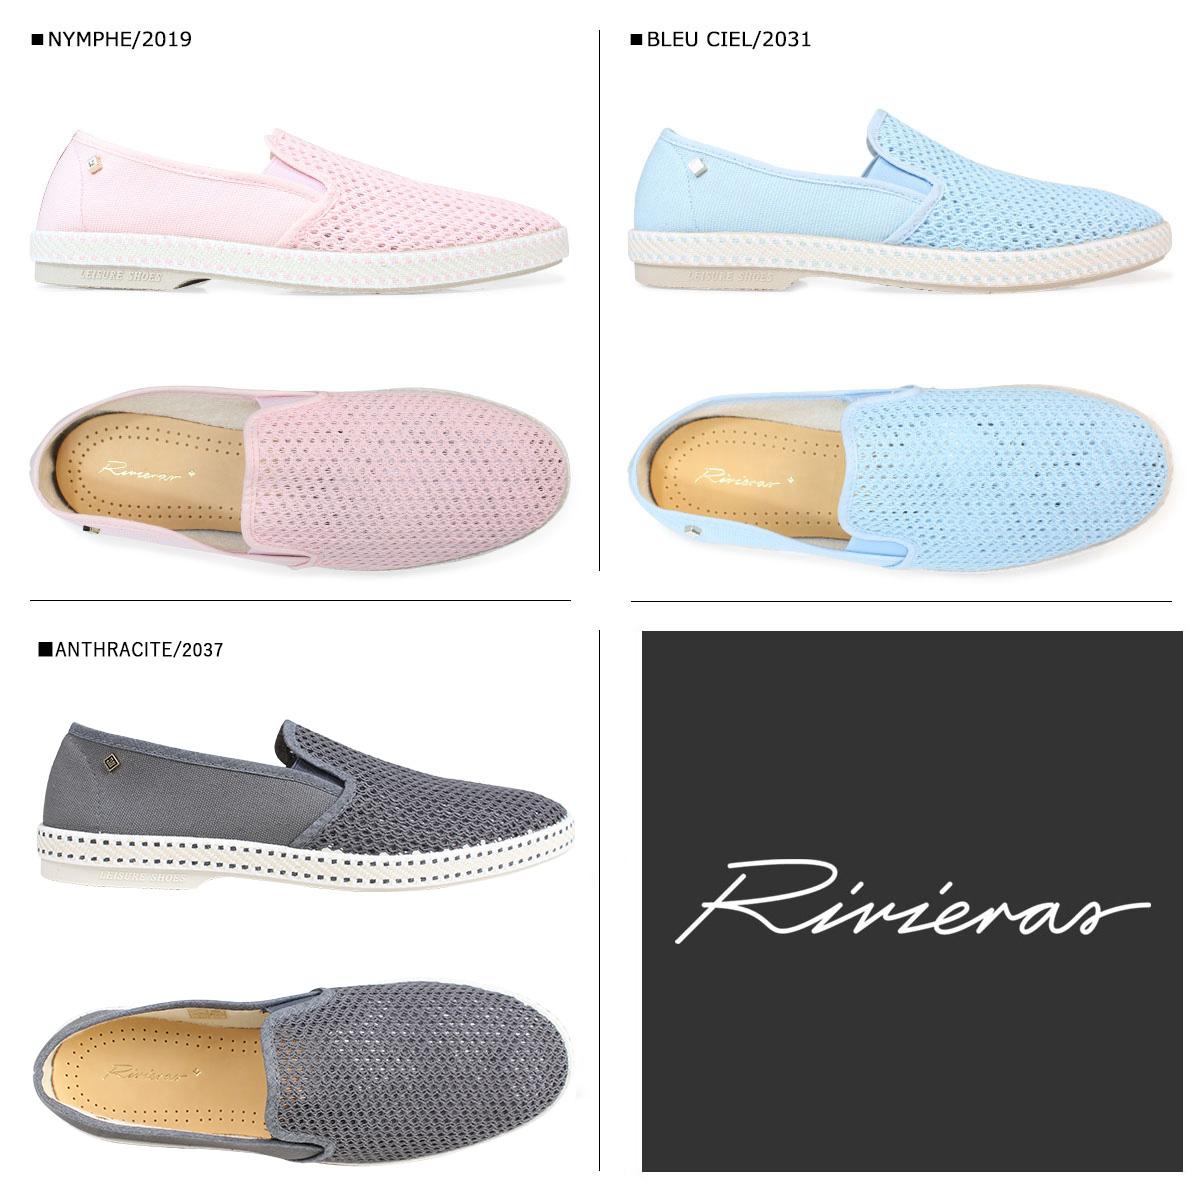 Riviera RIVIERAS mens slip-on CLASSIC shoe classic 20 20 ° Canvas mesh Riviera 7 color [3 / 11 new stock] [regular] ★ ★